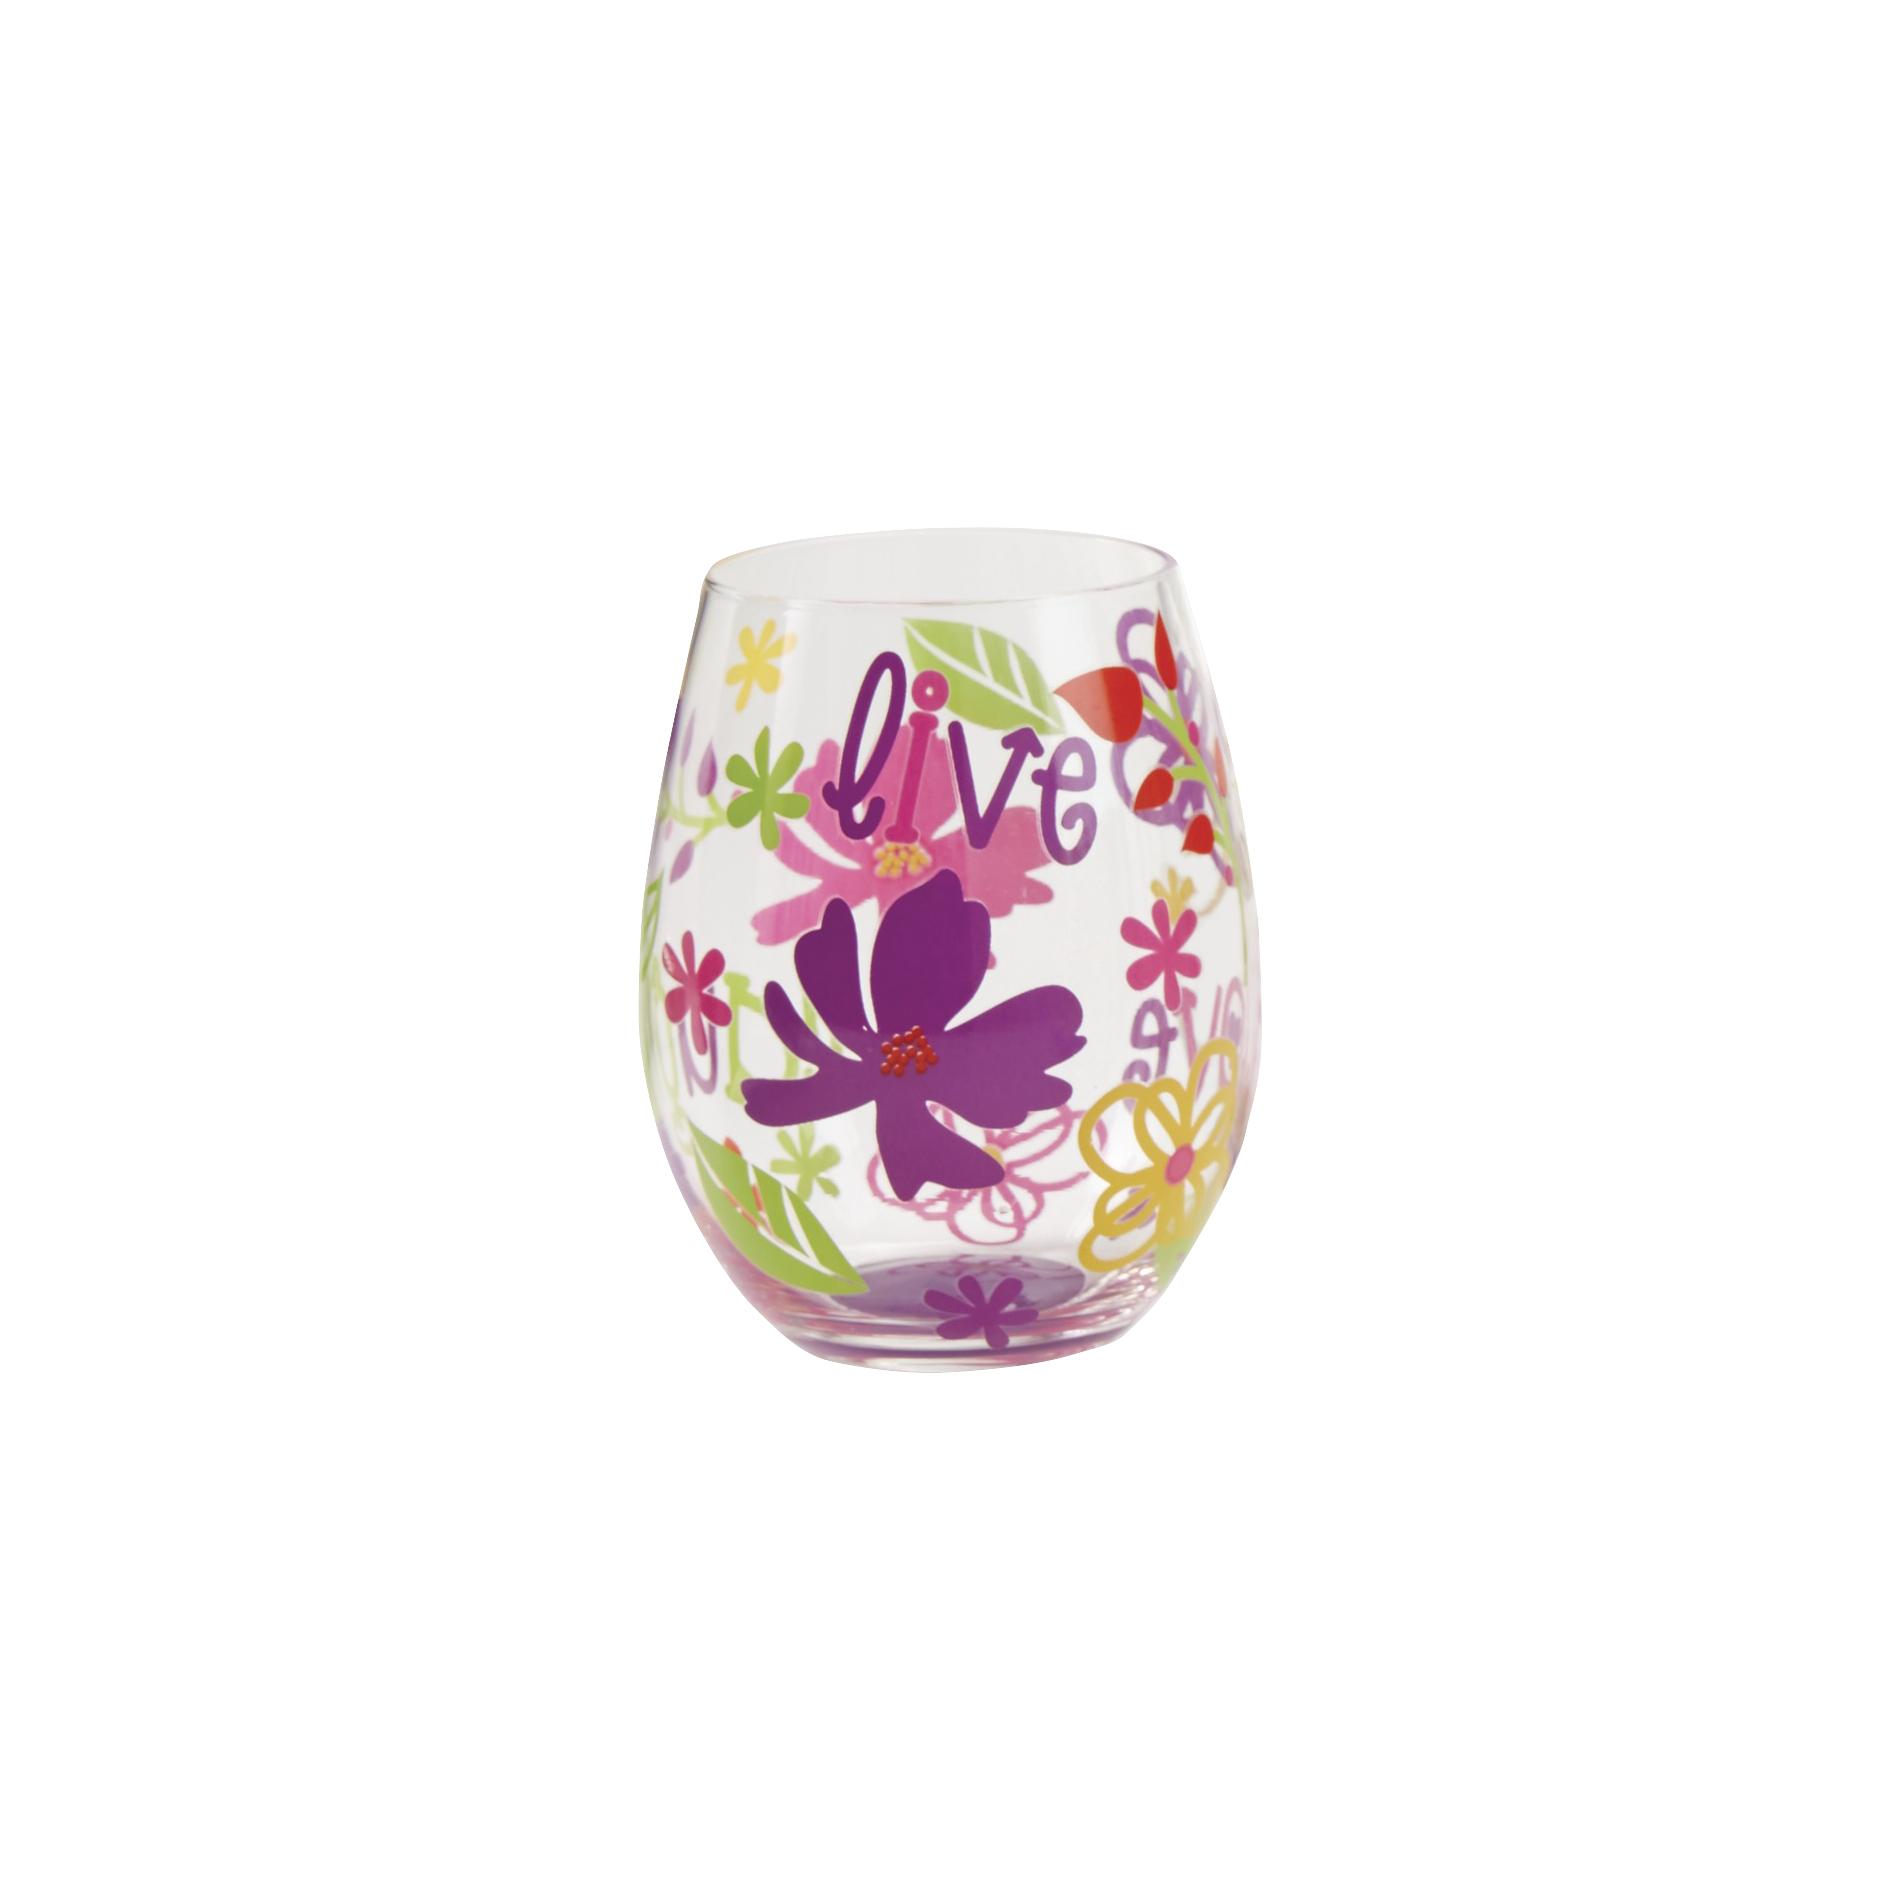 Image of Stemless Wine Glass-Hello Wine